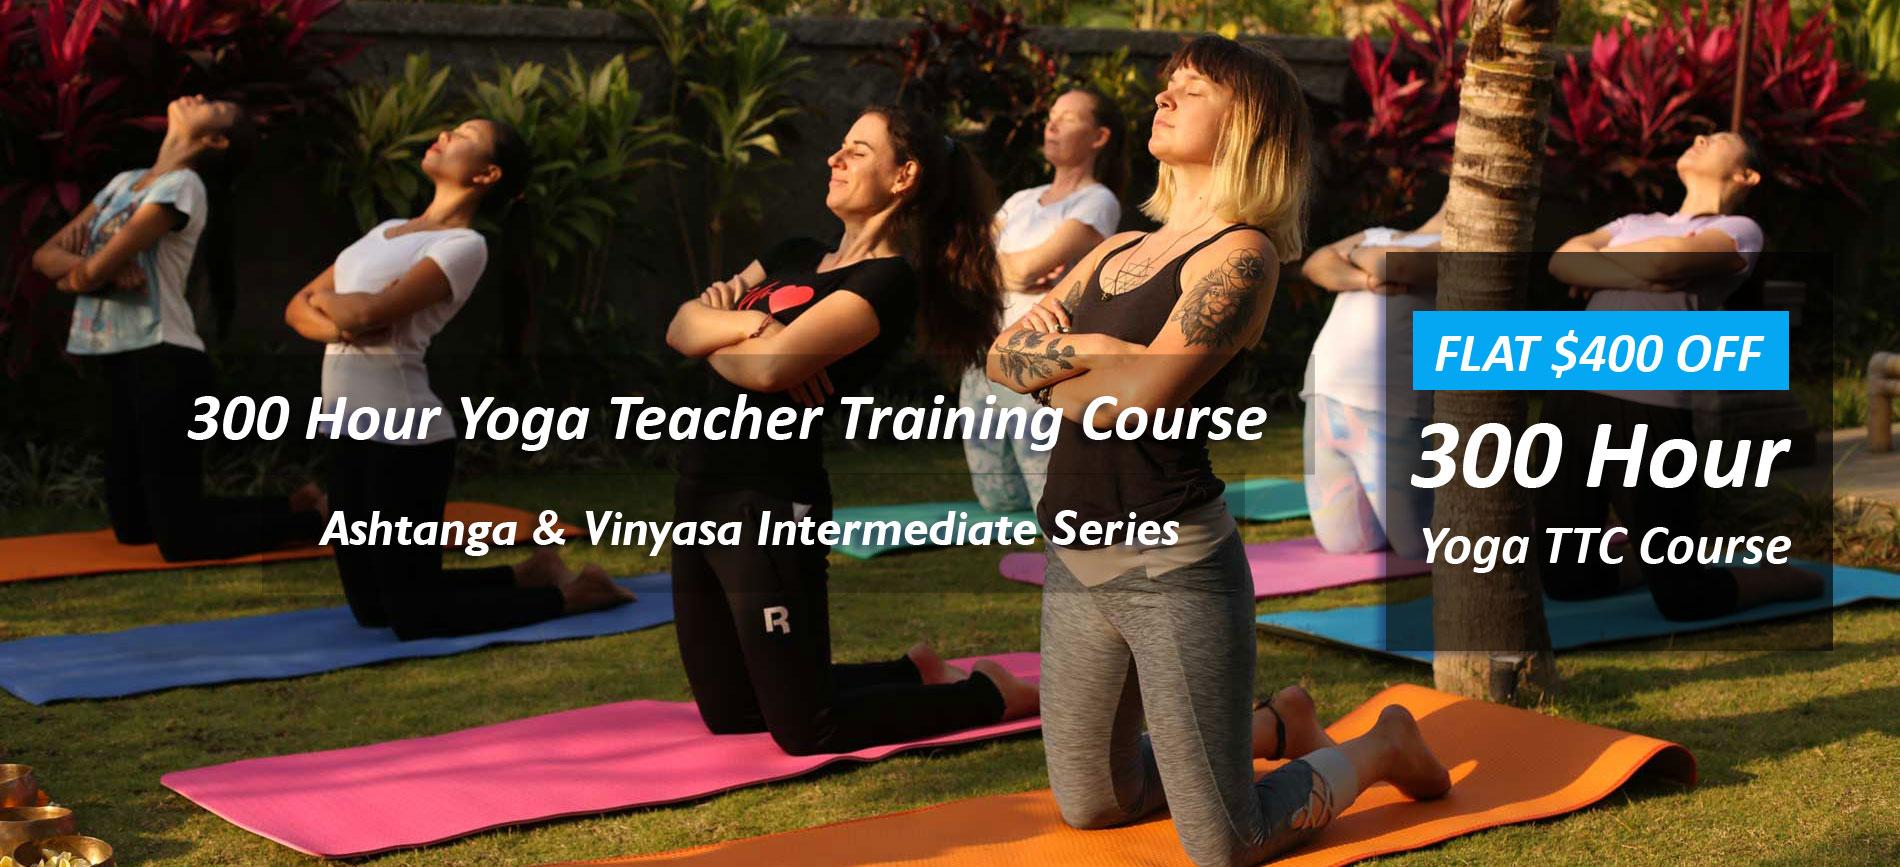 300 Hour Yoga Teacher Training In Bali Indonesia 2199 Usd